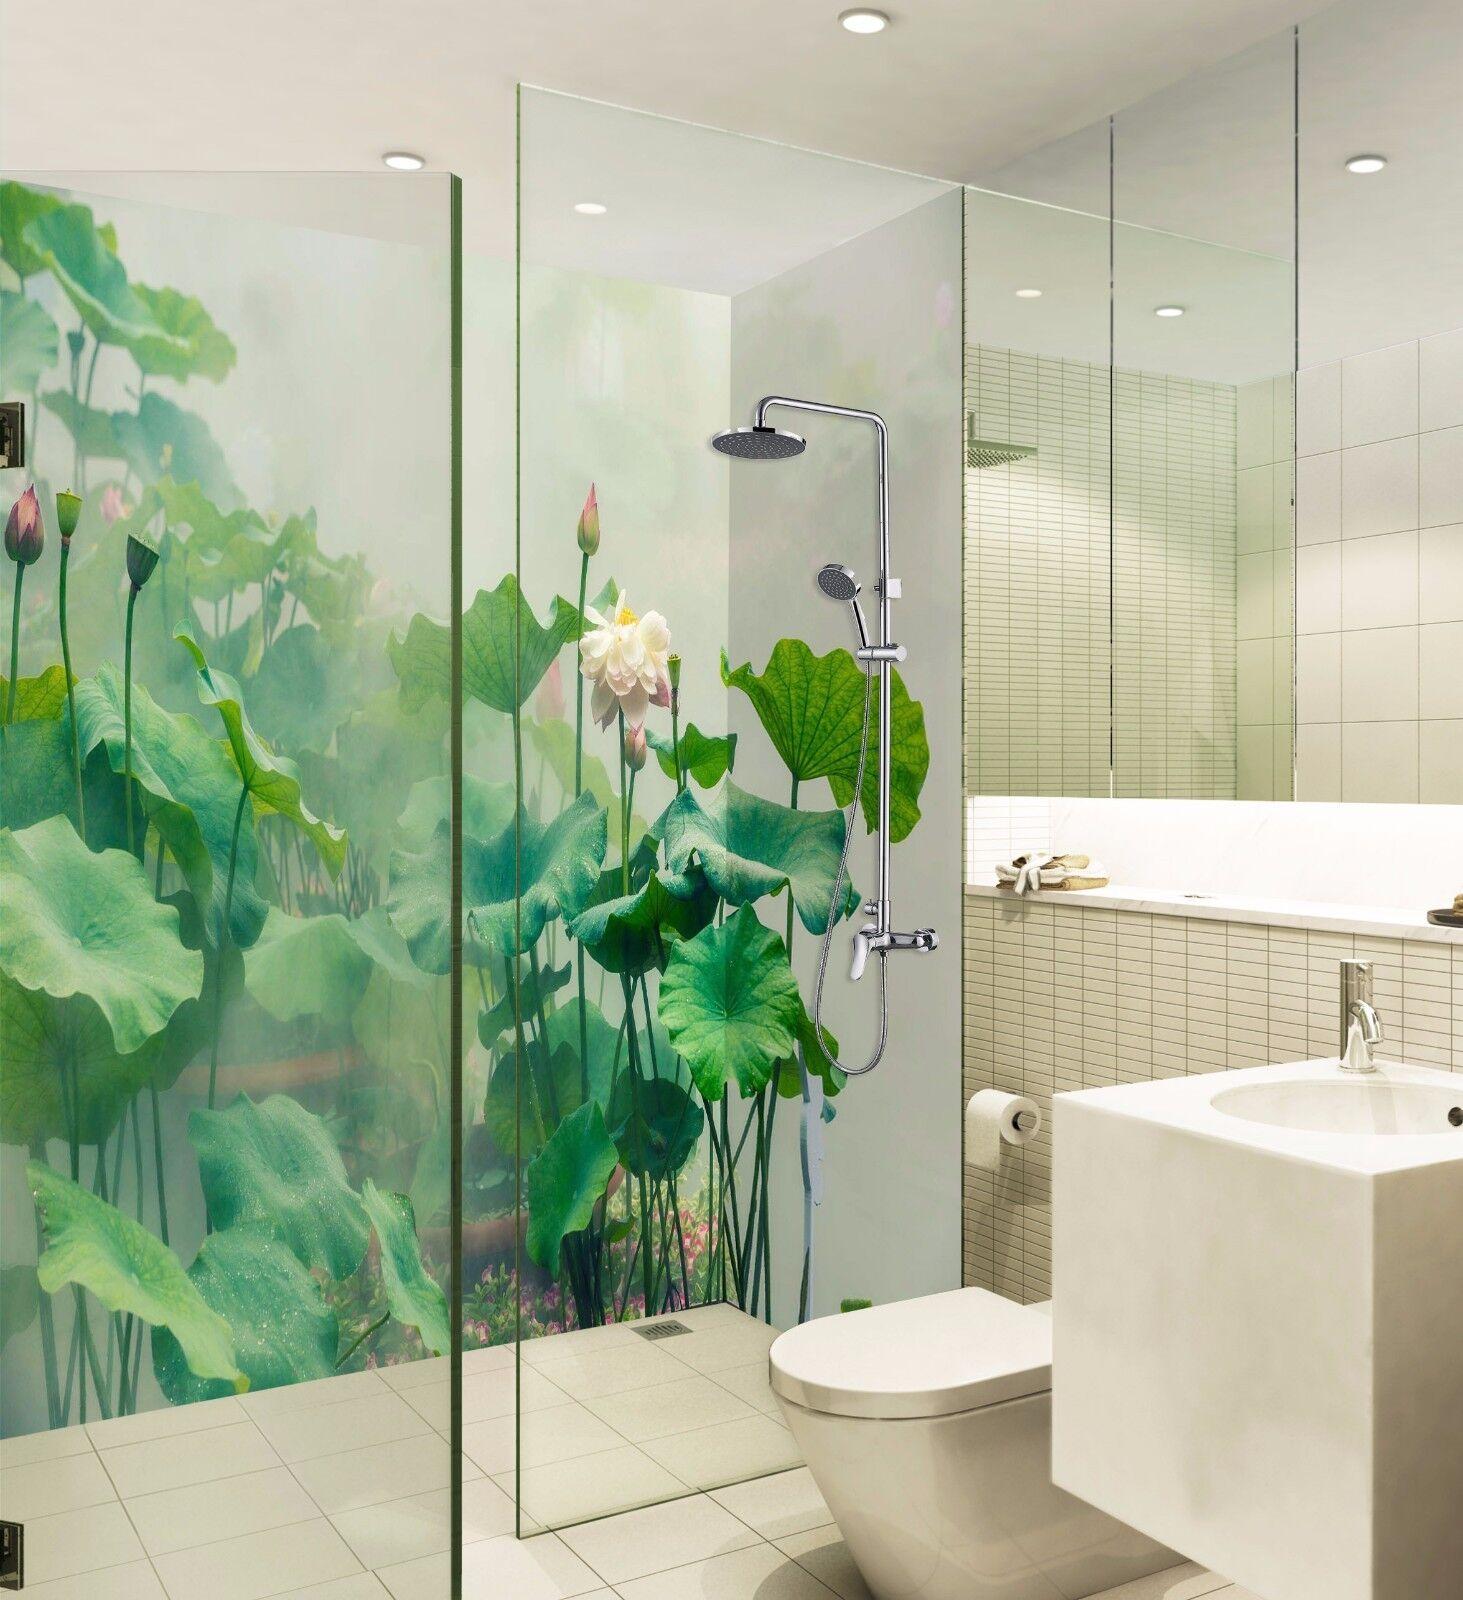 3D Grün Lotus Leaf 422 WallPaper Bathroom Print Decal Wall Deco AJ WALLPAPER AU